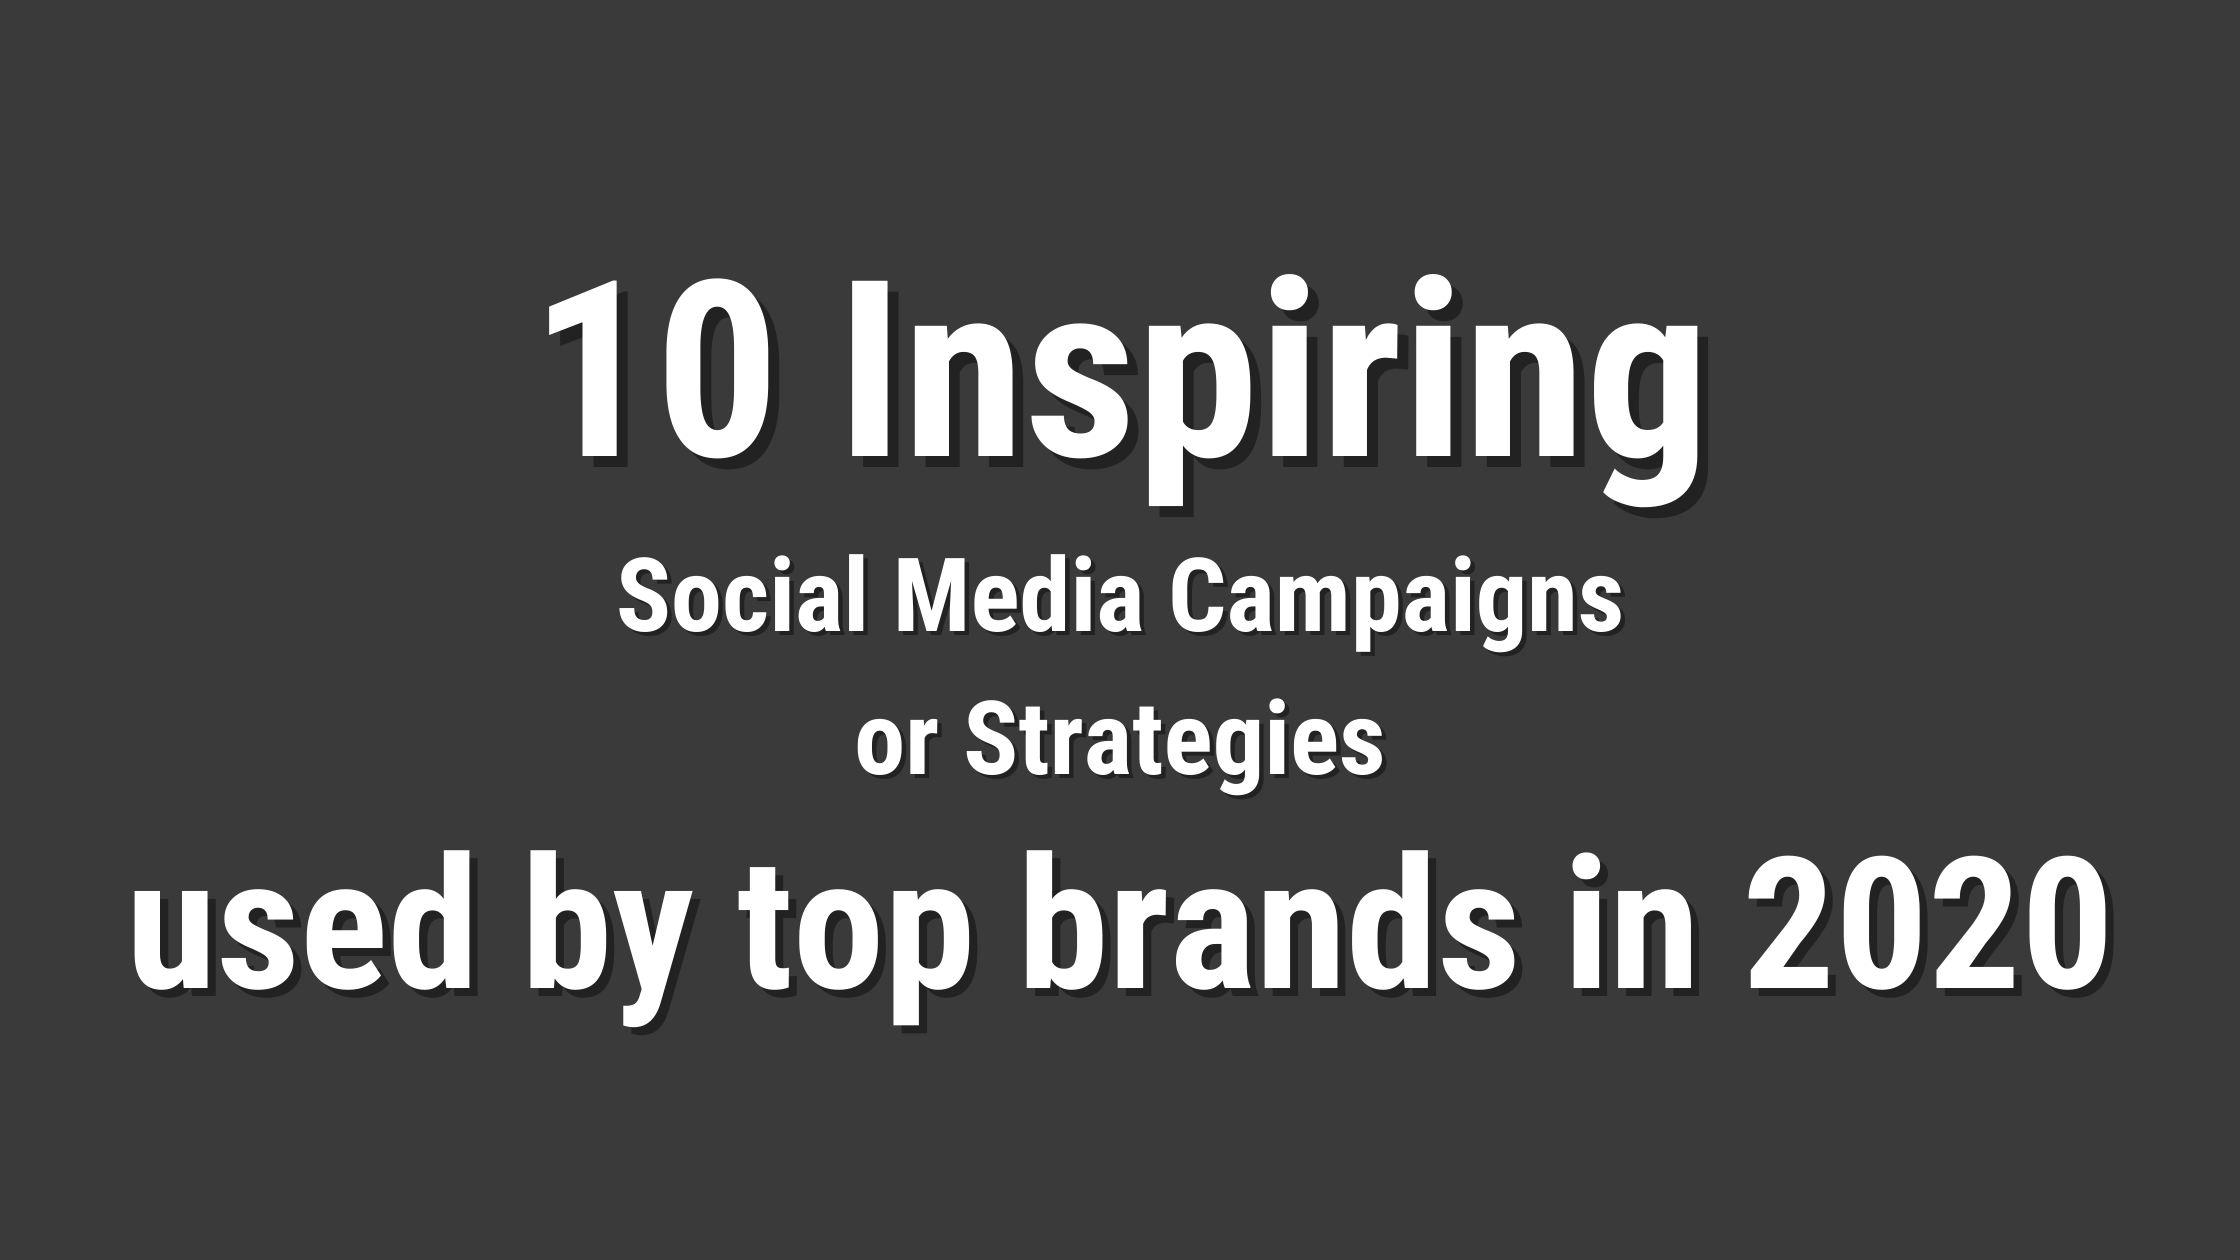 10 Inspiring Social Media campaigns or Strategies used by top brands in 2020